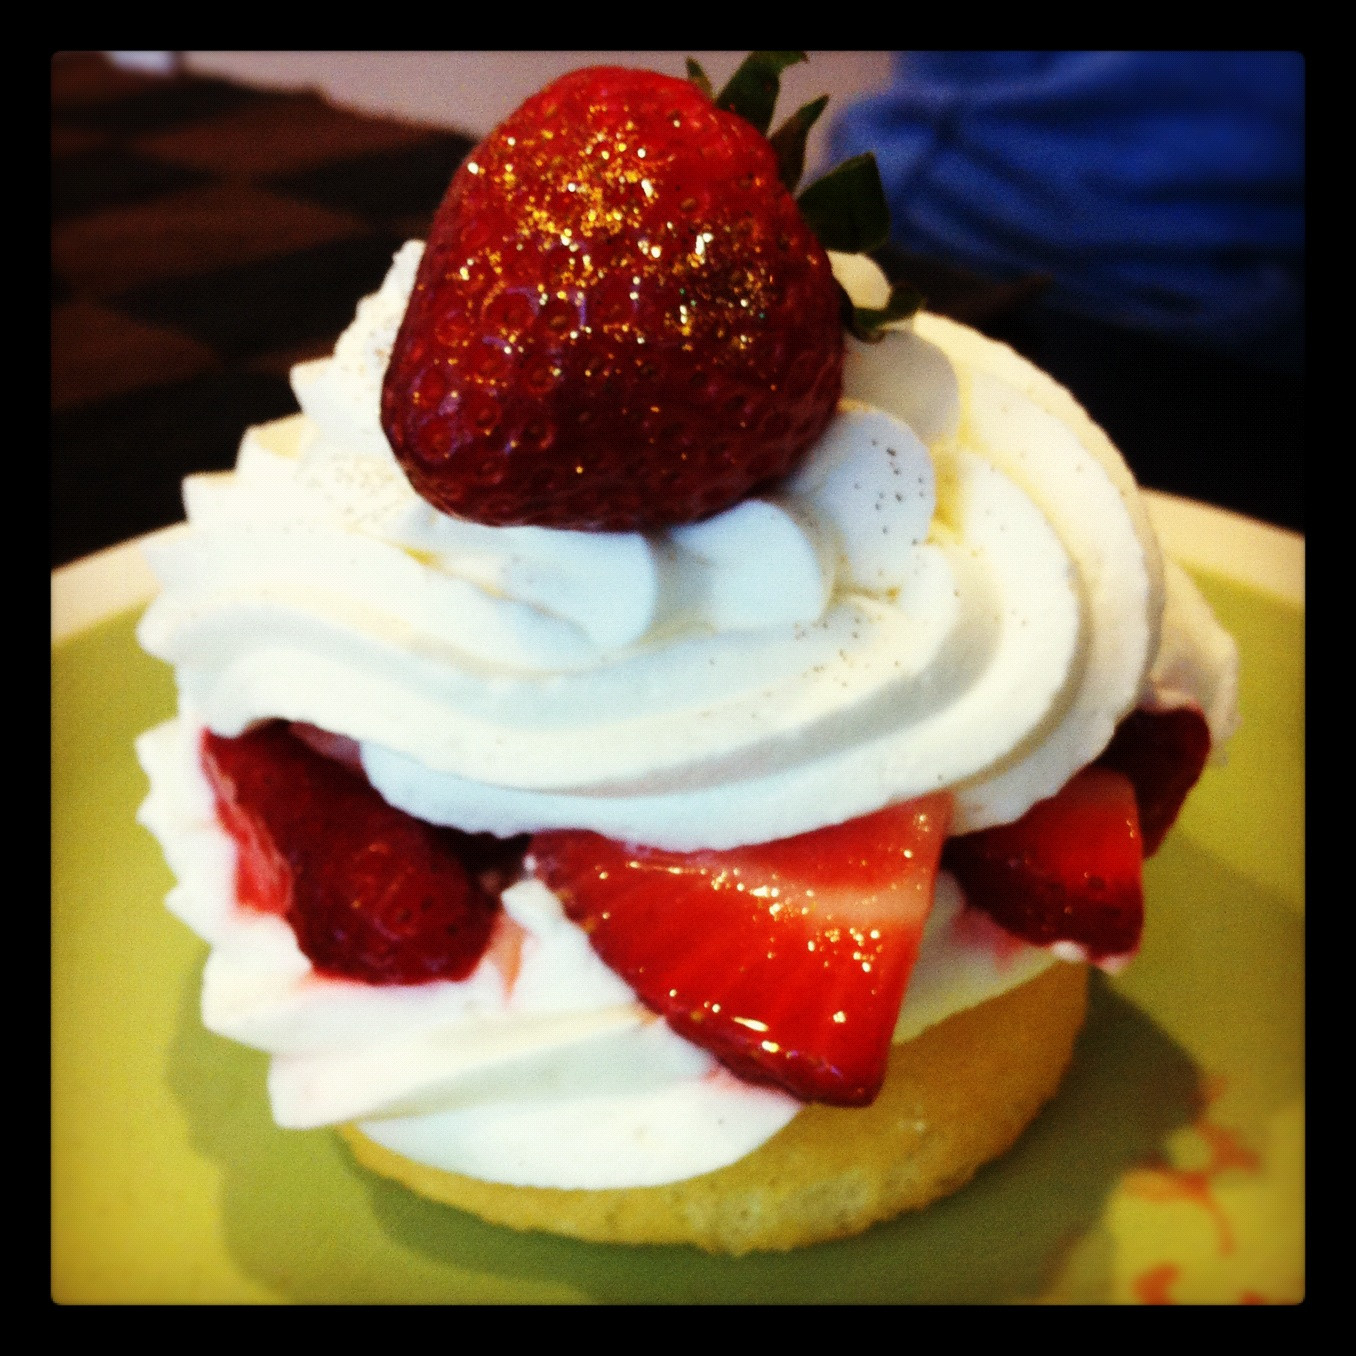 Strawberry Shortcake Dessert Recipes  Strawberry Shortcake Recipe – Got Mixer